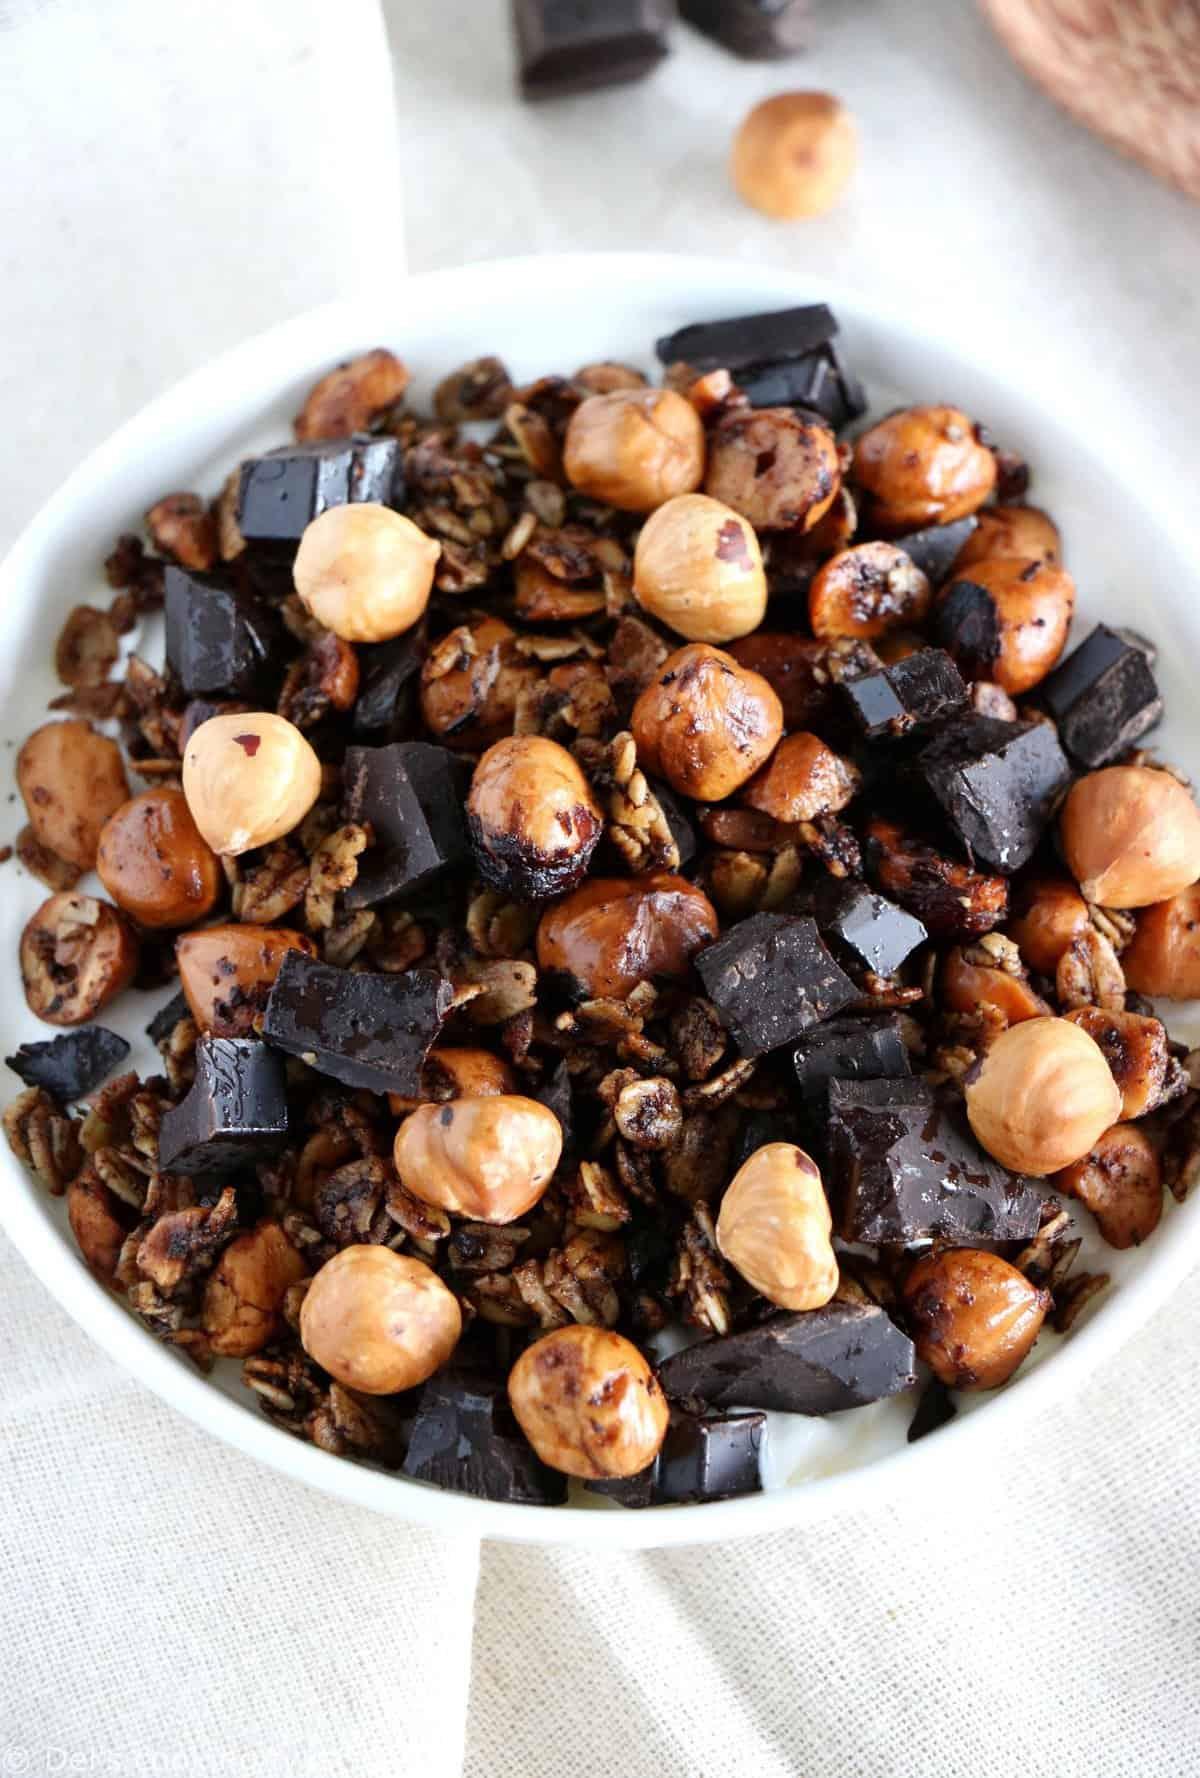 Coffee-Chocolate Hazelnut Granola